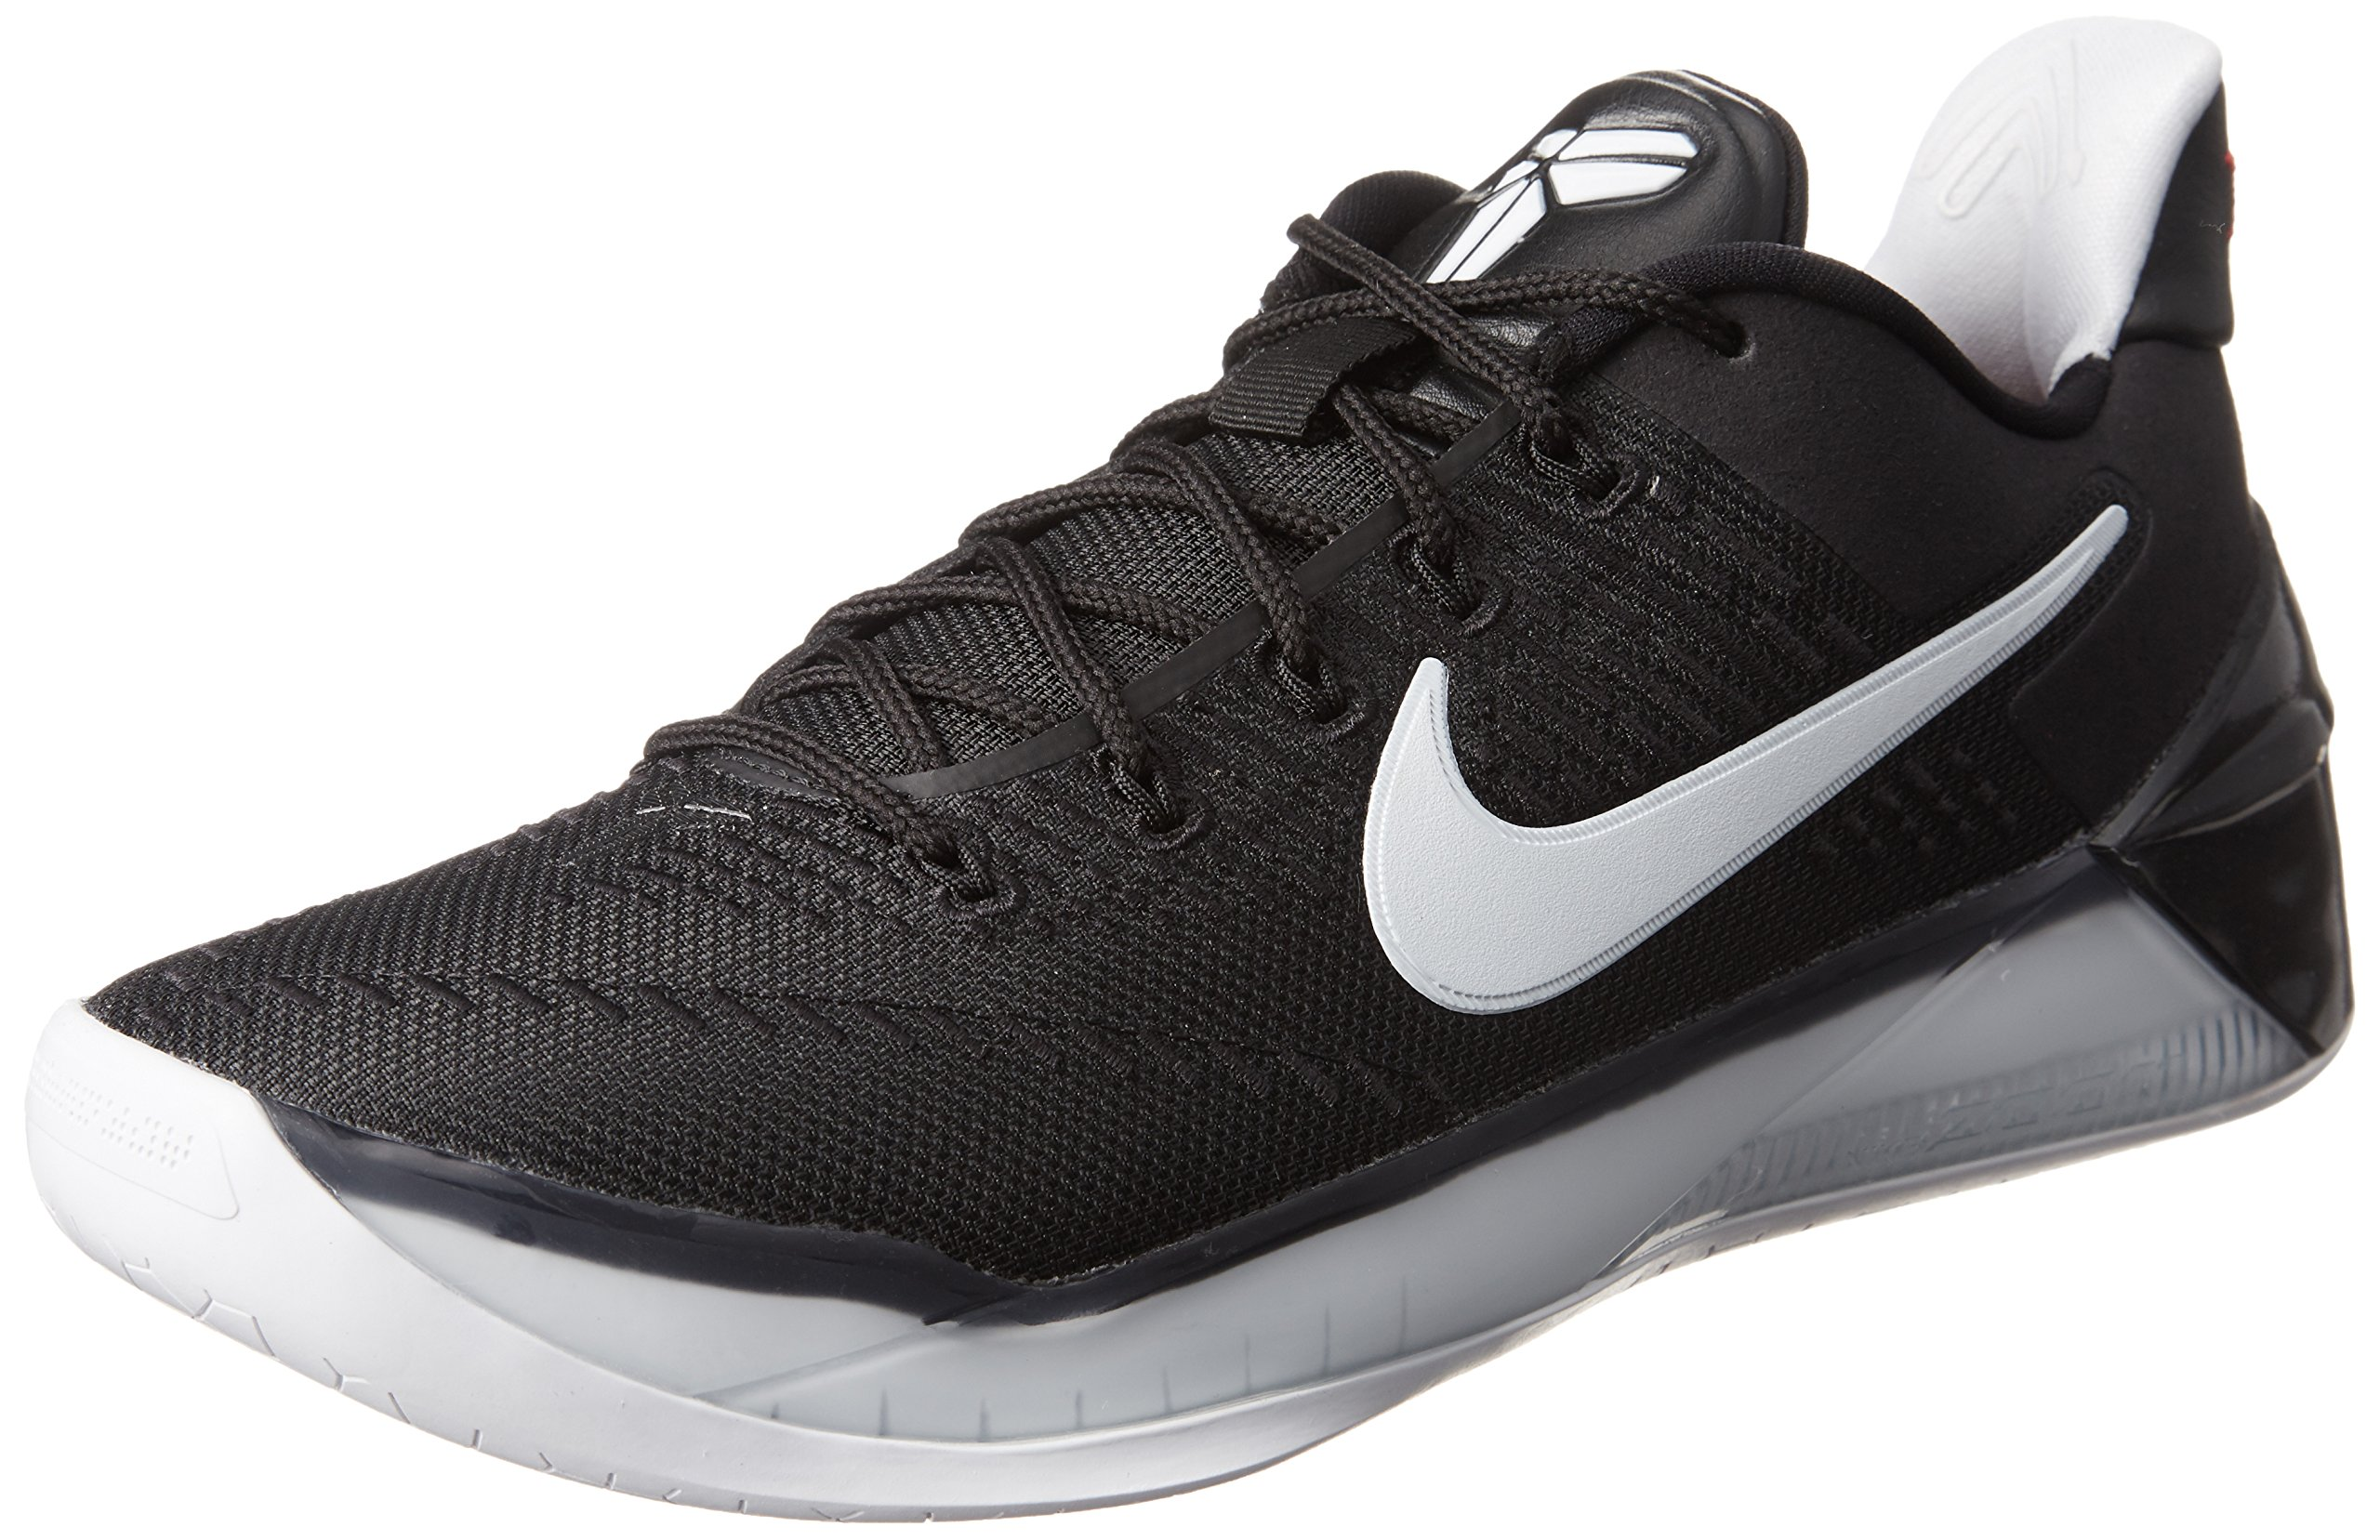 best website db681 97421 Galleon - Nike Men s Kobe A.D. Basketball Shoes (9, Black White-Black)